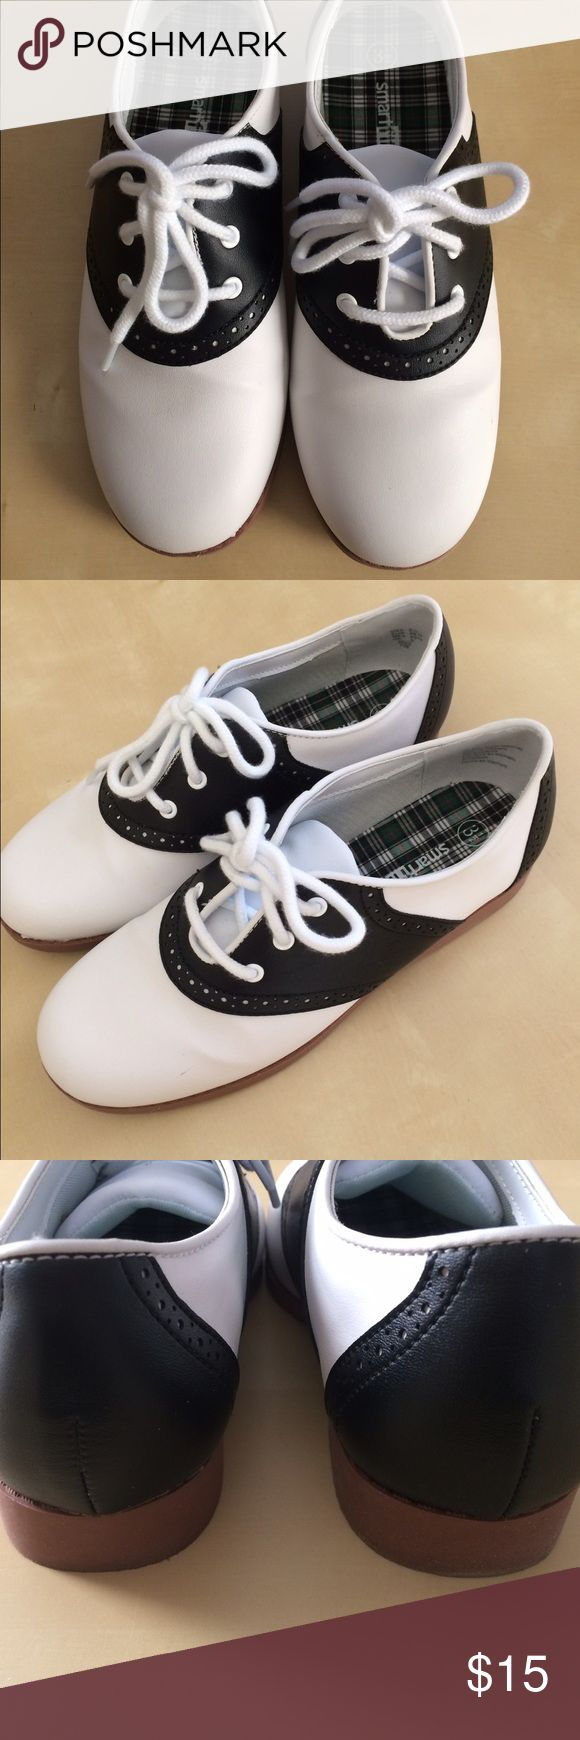 Classic Girl's Saddle Shoes - Saddle Oxfords Classic girl's saddle oxfords Shoes